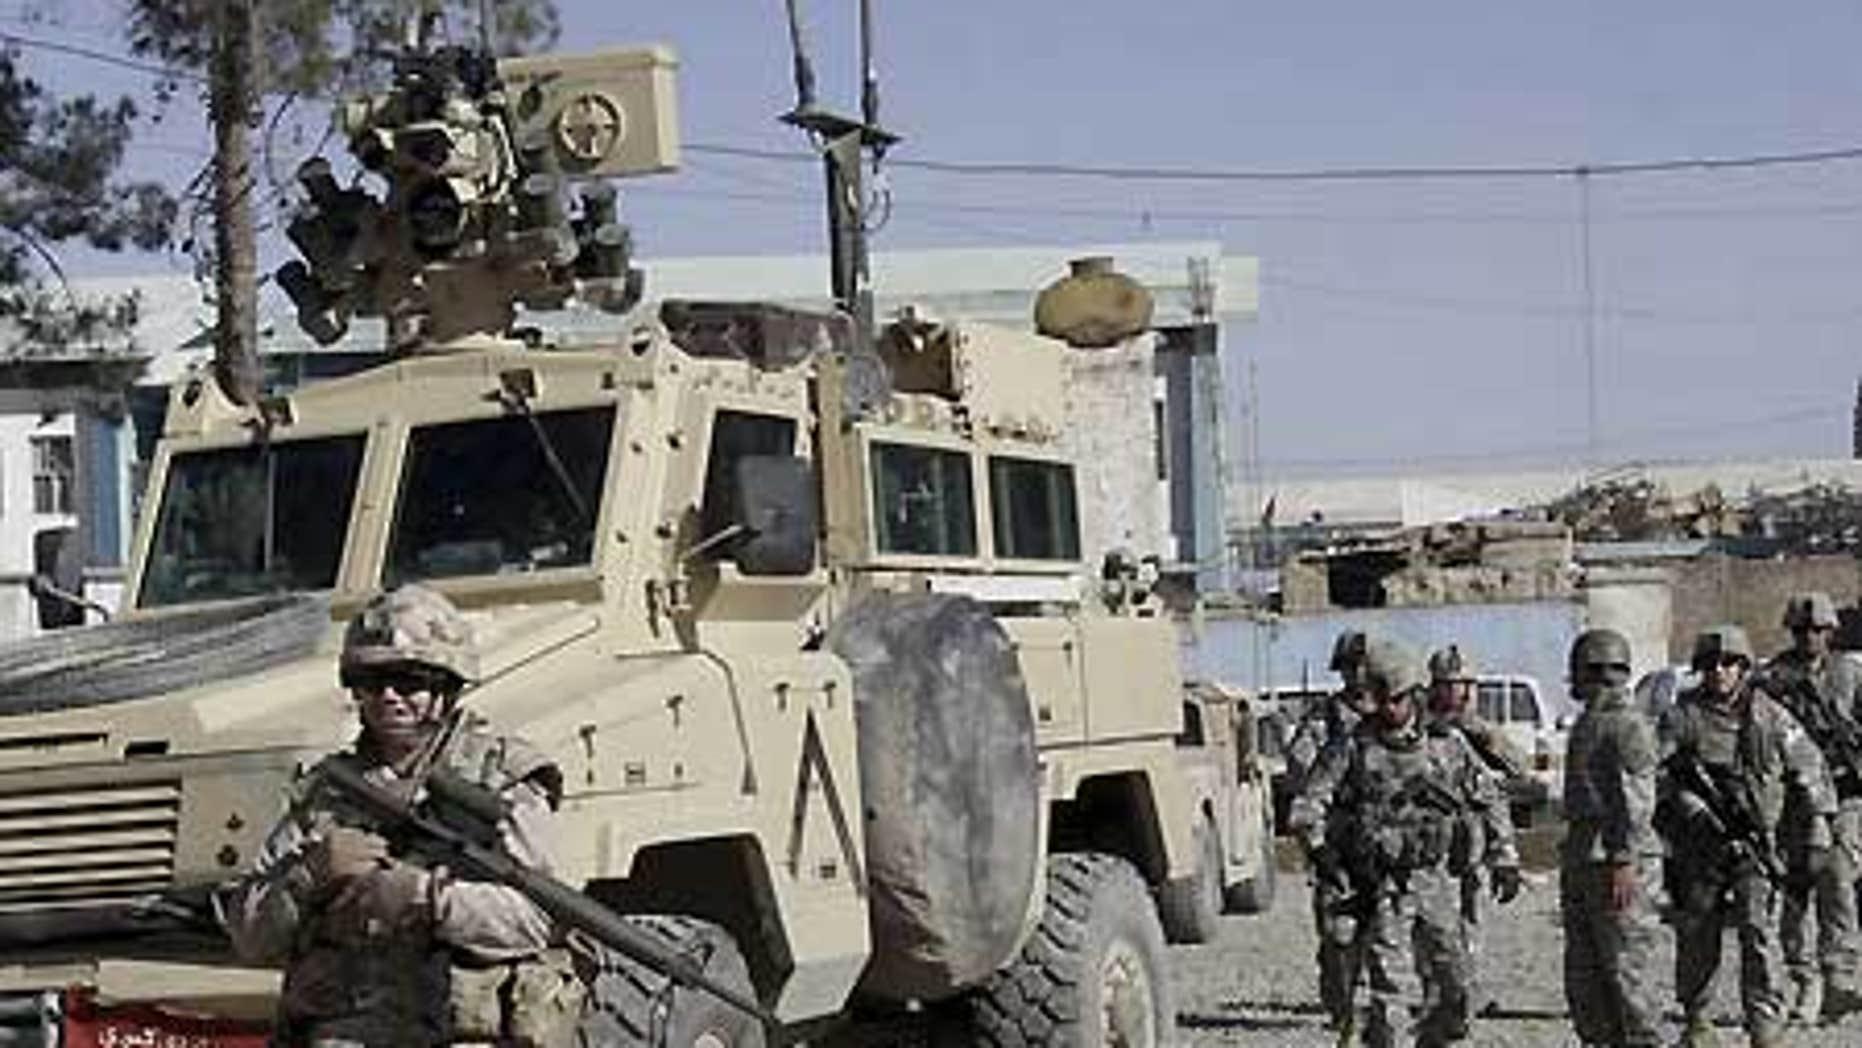 Feb. 15: U.S., Canadian soldiers investigate suspected Taliban militants in Kandahar, Afghanistan.